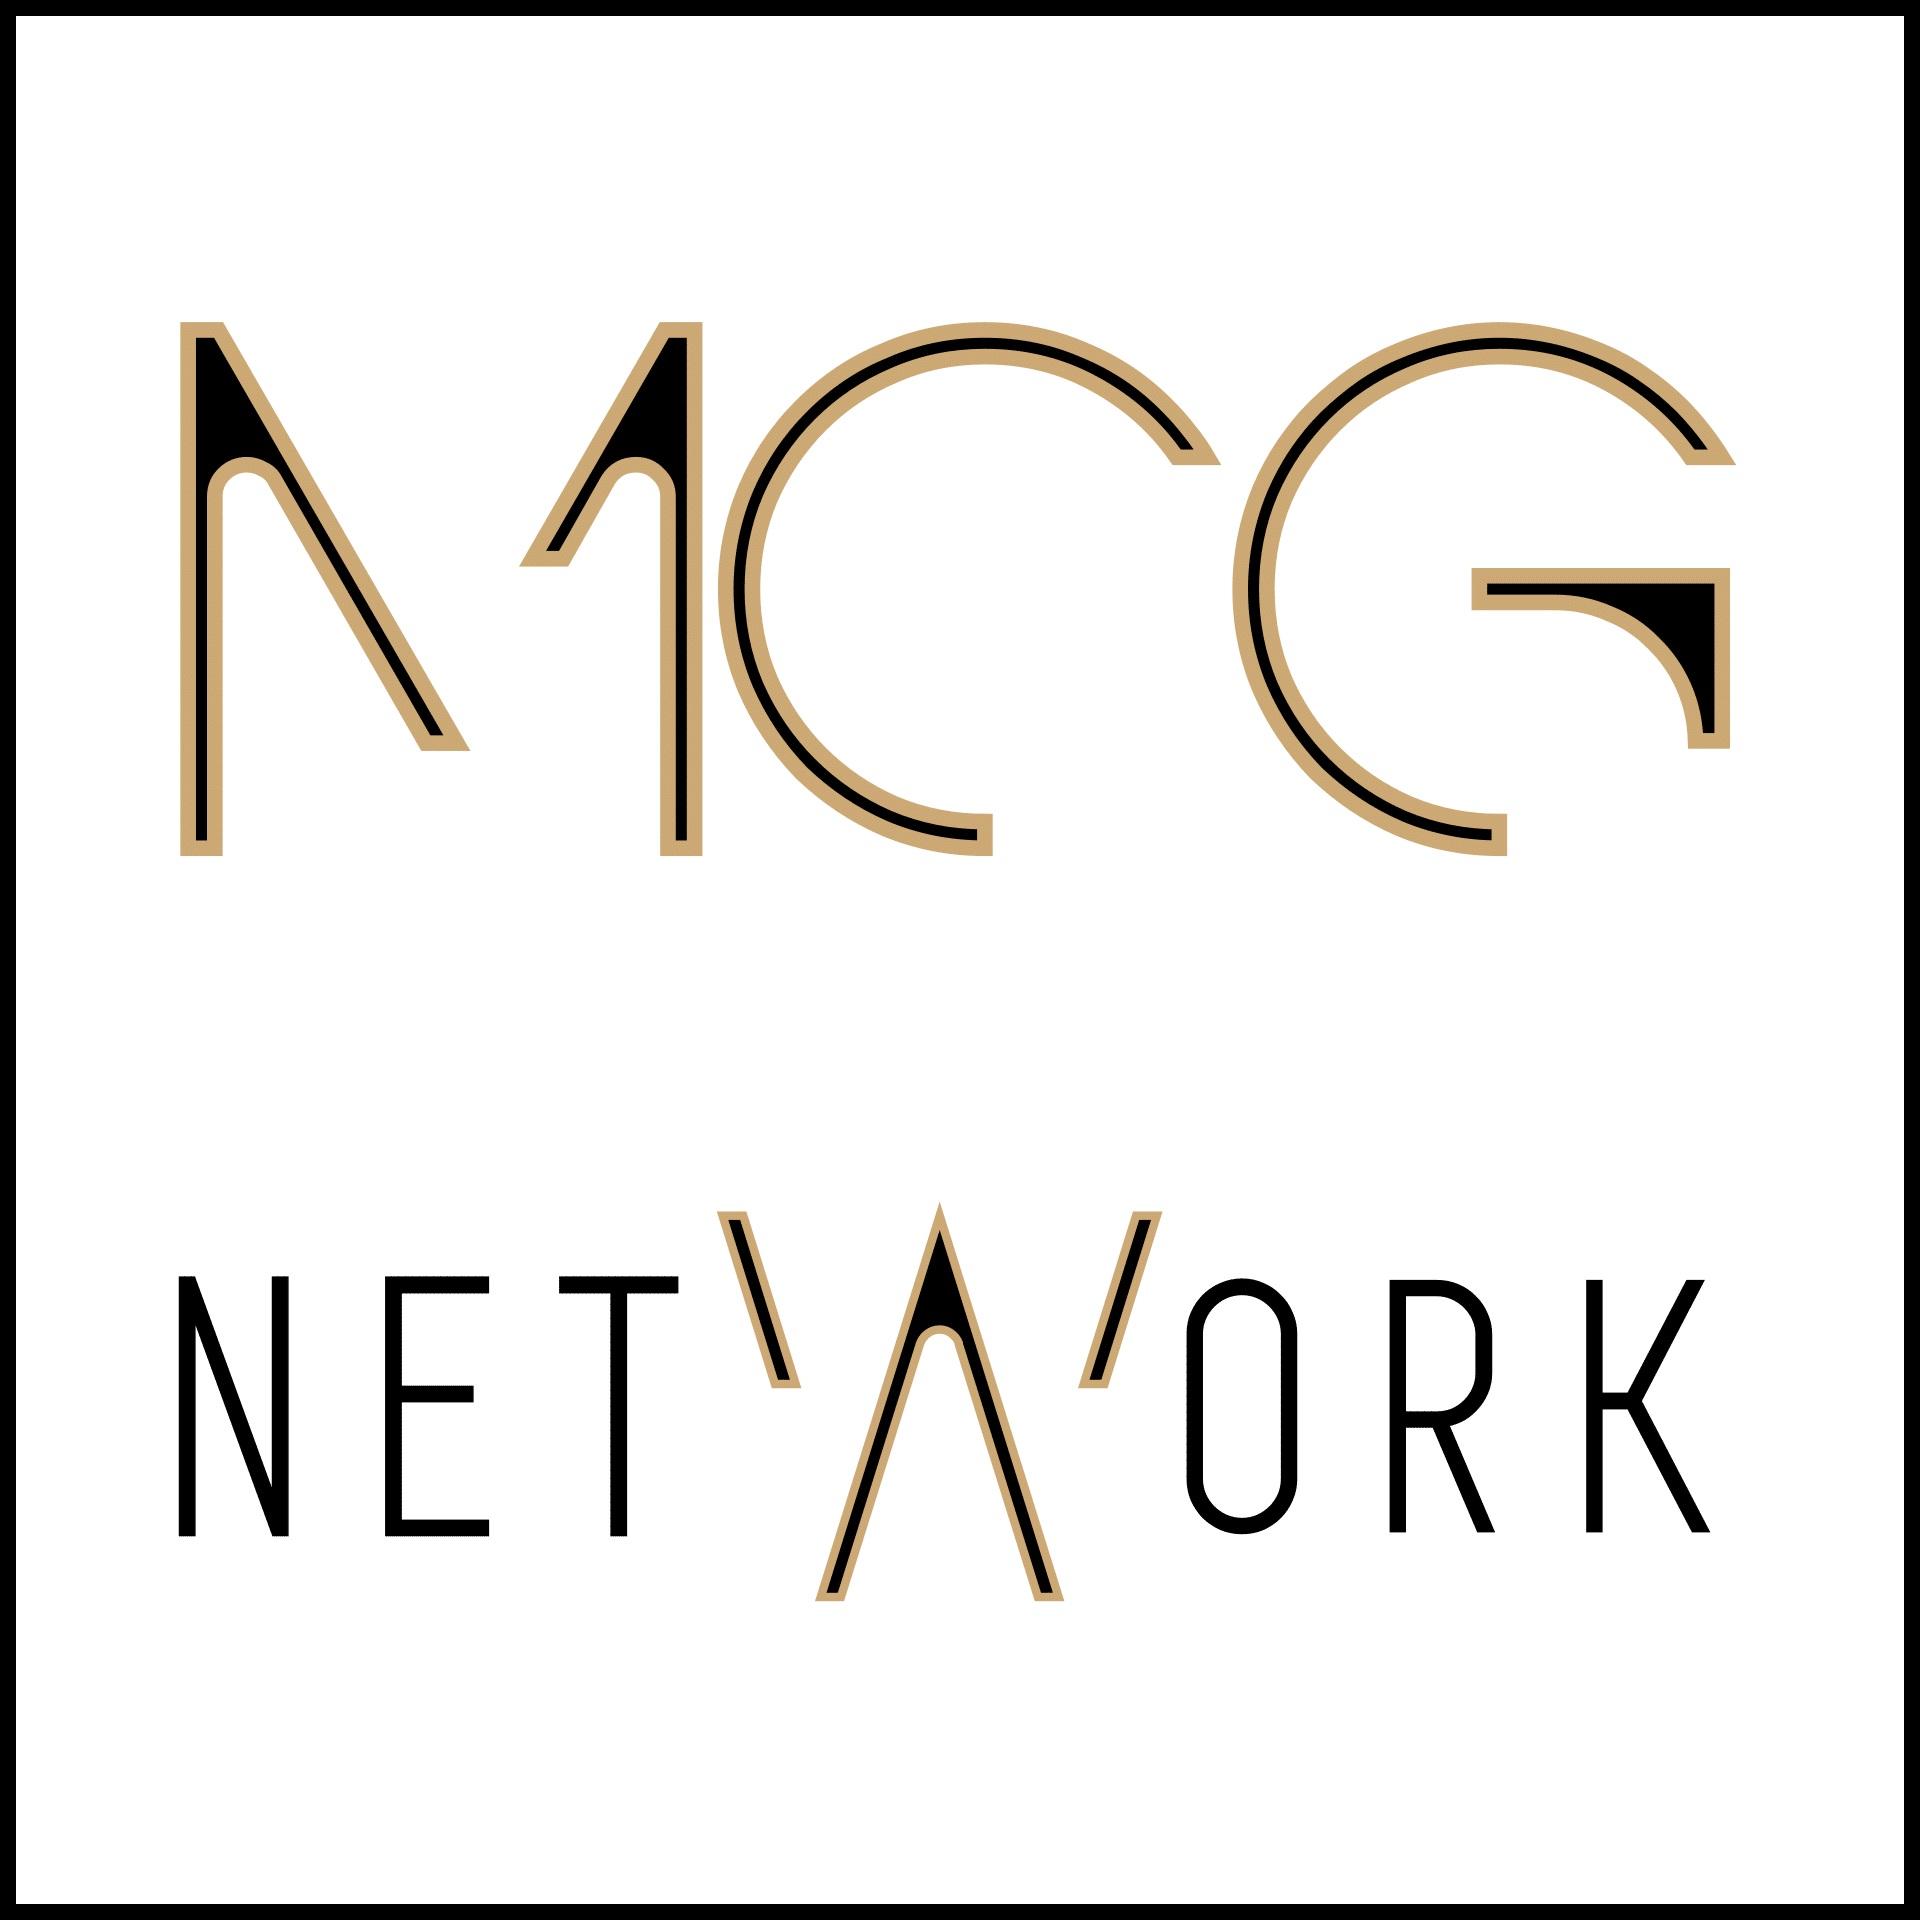 MCG Network